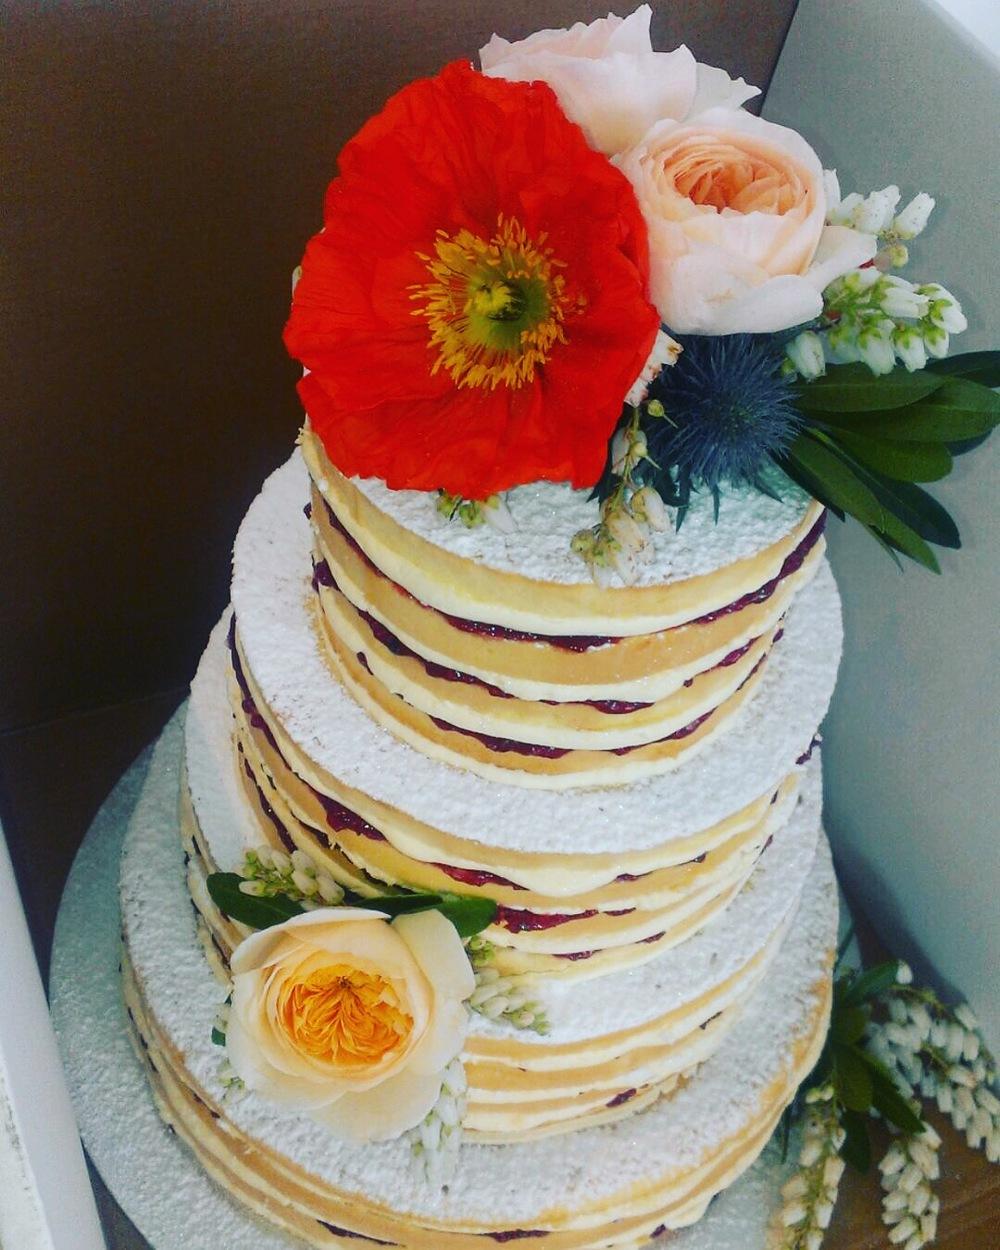 Vanilla Pod 3 tier naked wedding cake with fresh poppies.JPG